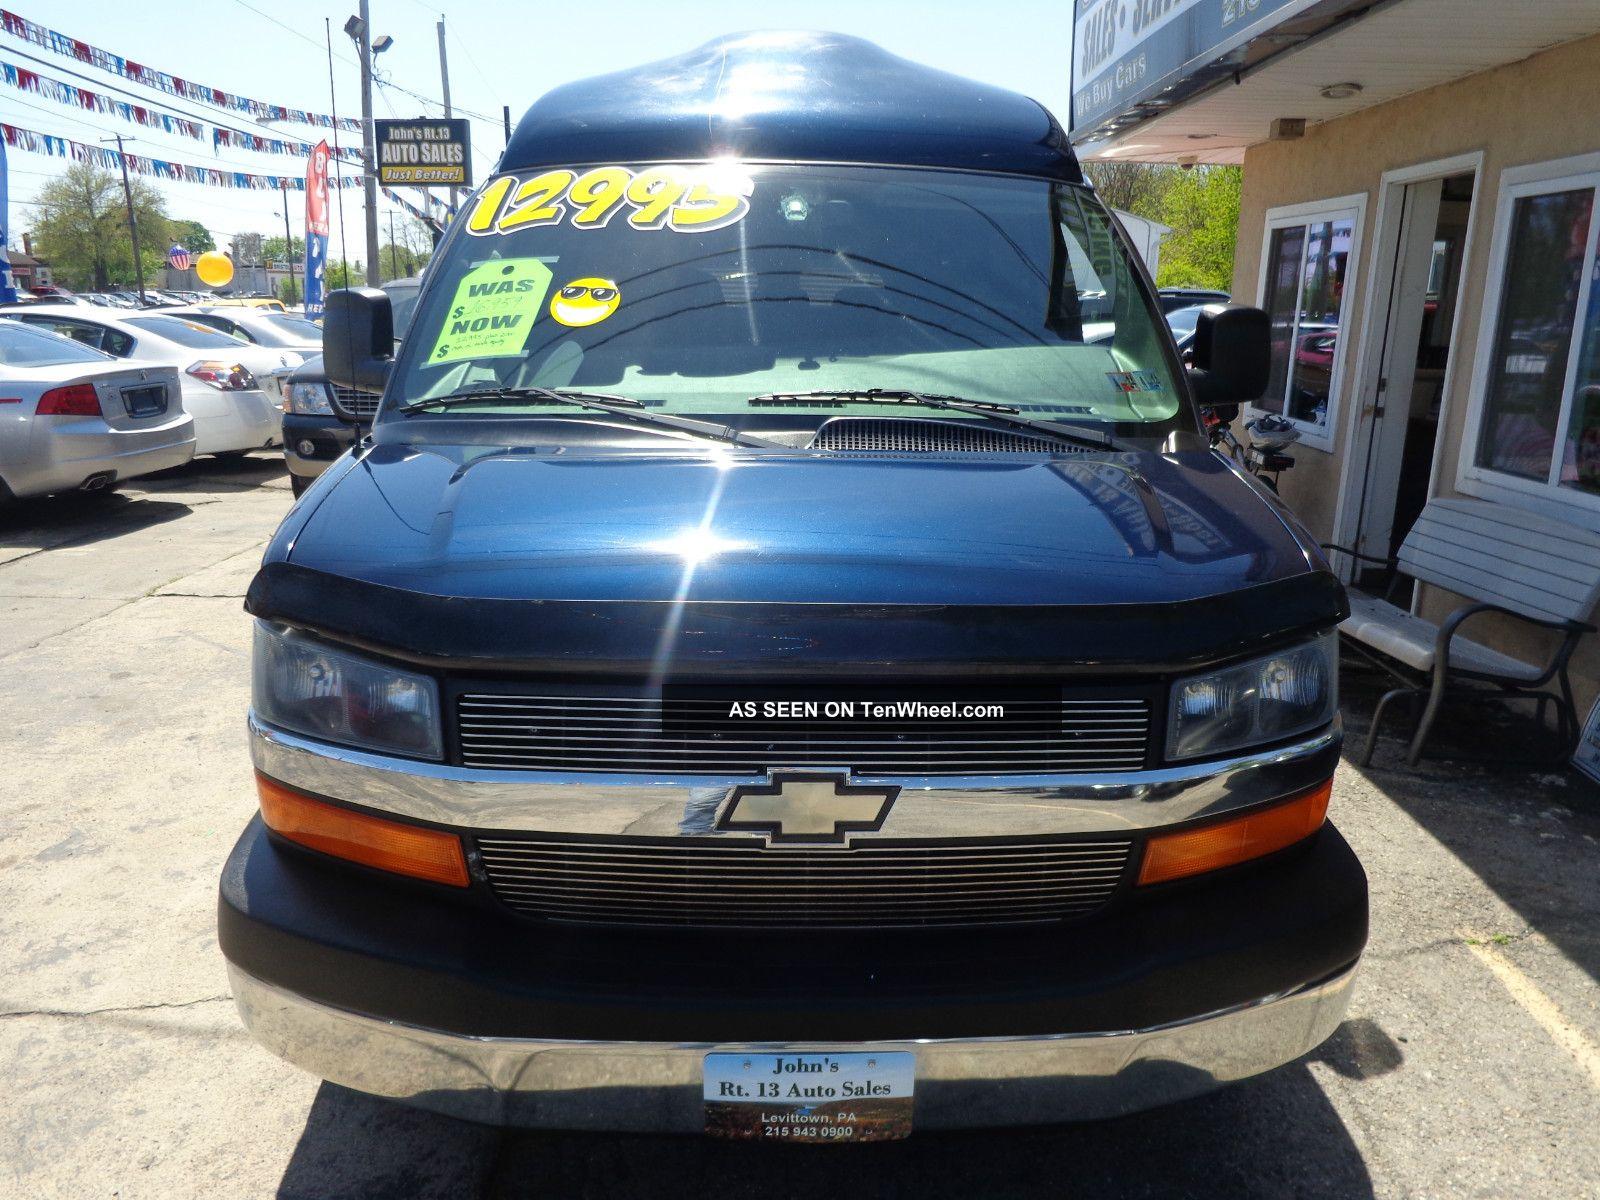 Lakeside Chevrolet Buick Gmc >> 2005 Chevrolet Express Cargo Van Yf7 Upfitter | Autos Post